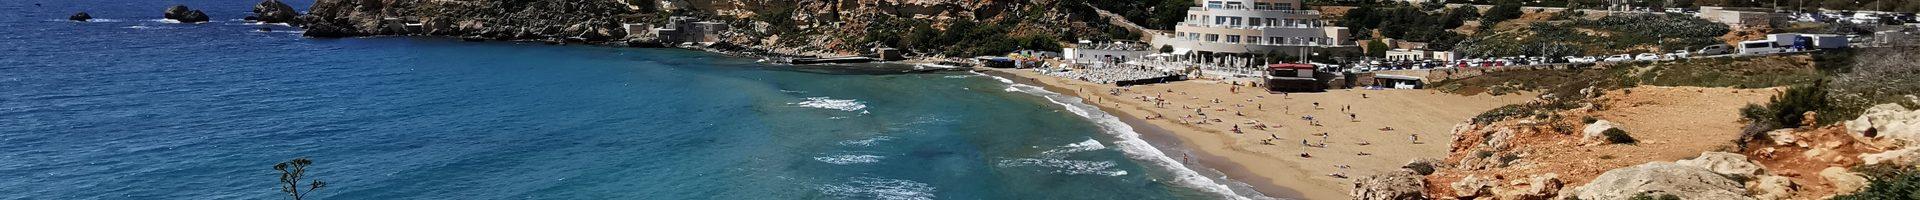 Pocket Beaches of Malta